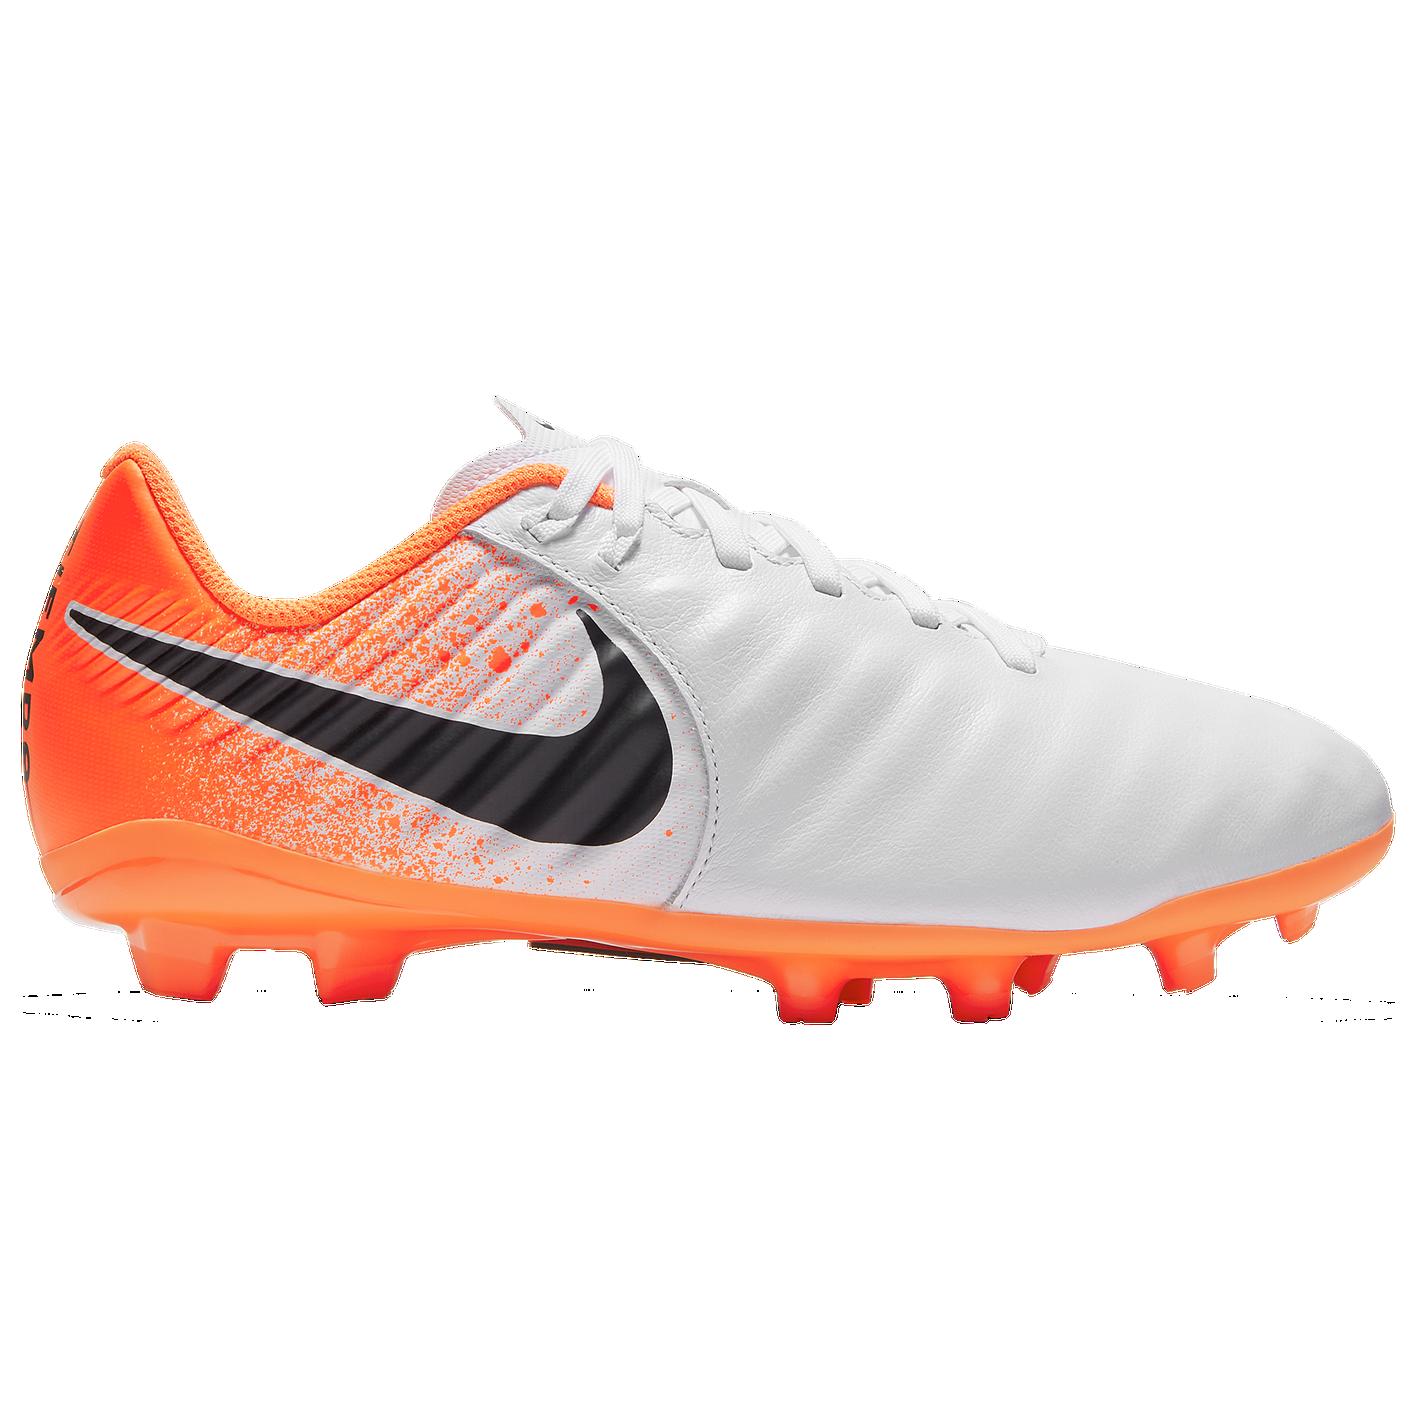 1f555fb74 Nike Tiempo Legend 7 Academy MG - Boys  Grade School - Soccer ...